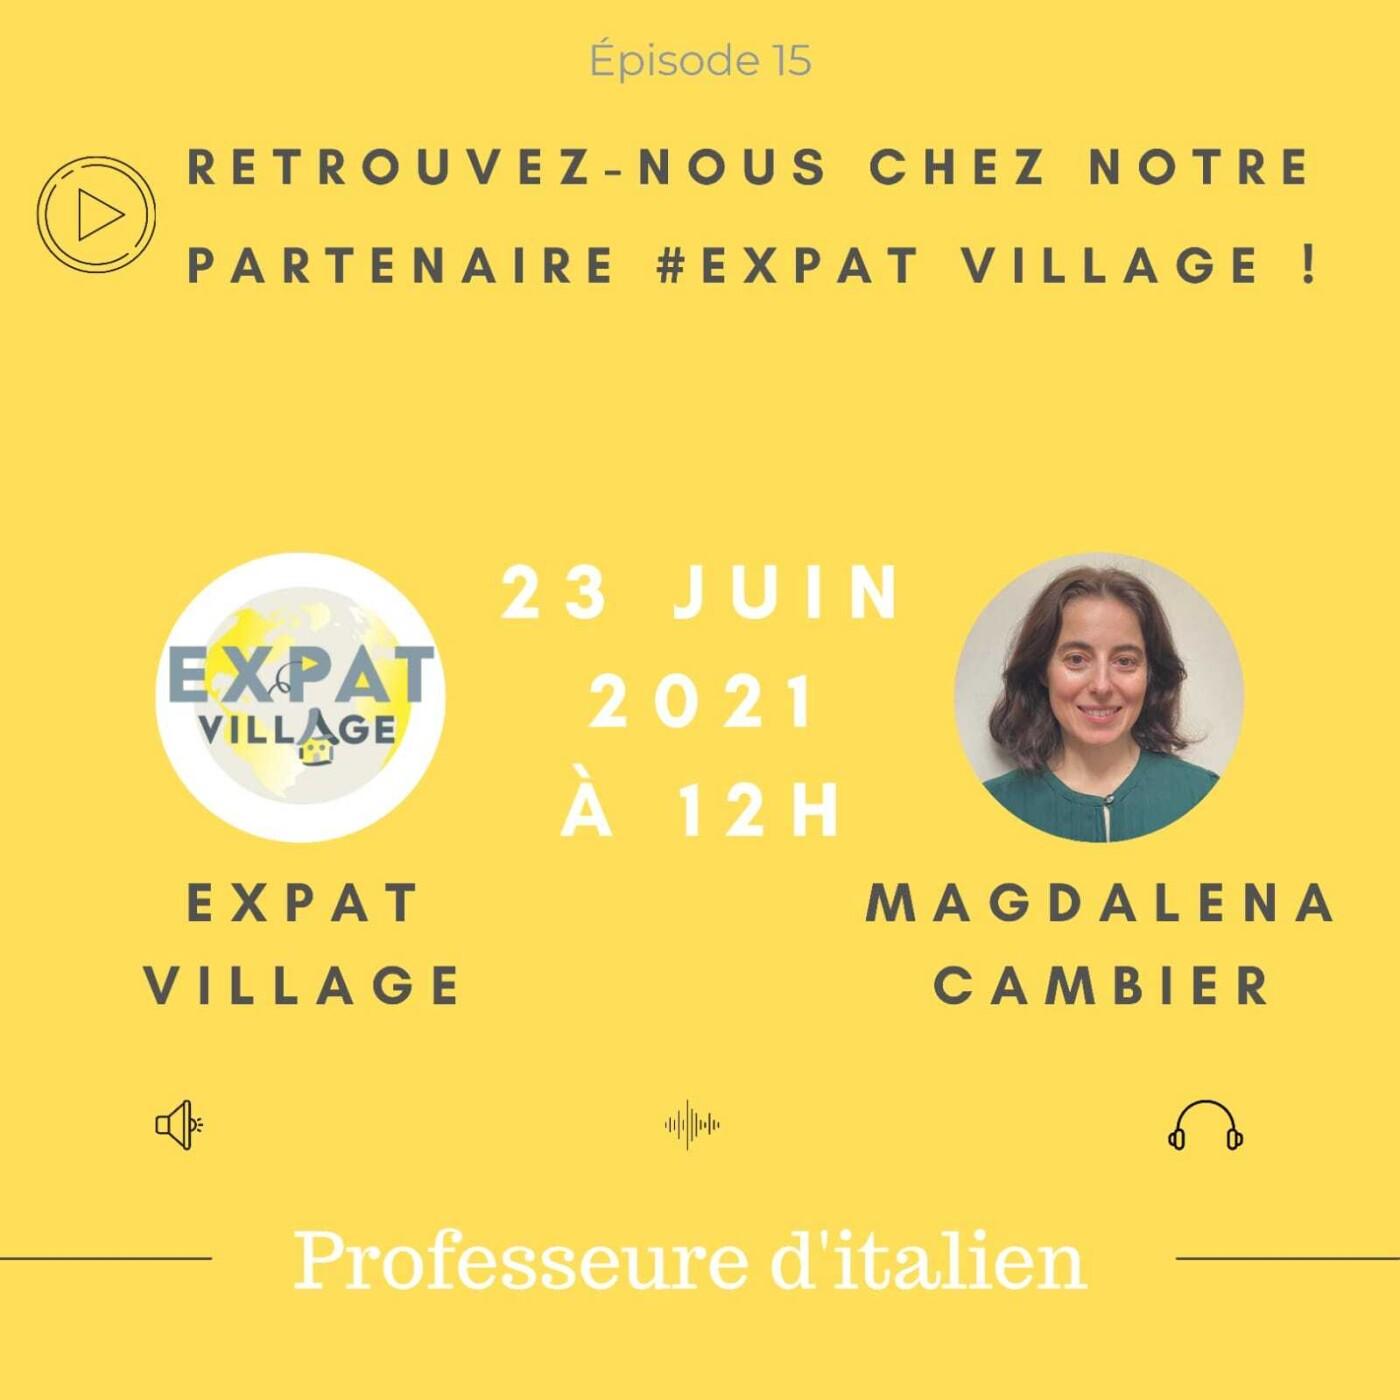 Magdalena et sa passion pour l'Italien - 23 06 2021 - StereoChic Radio